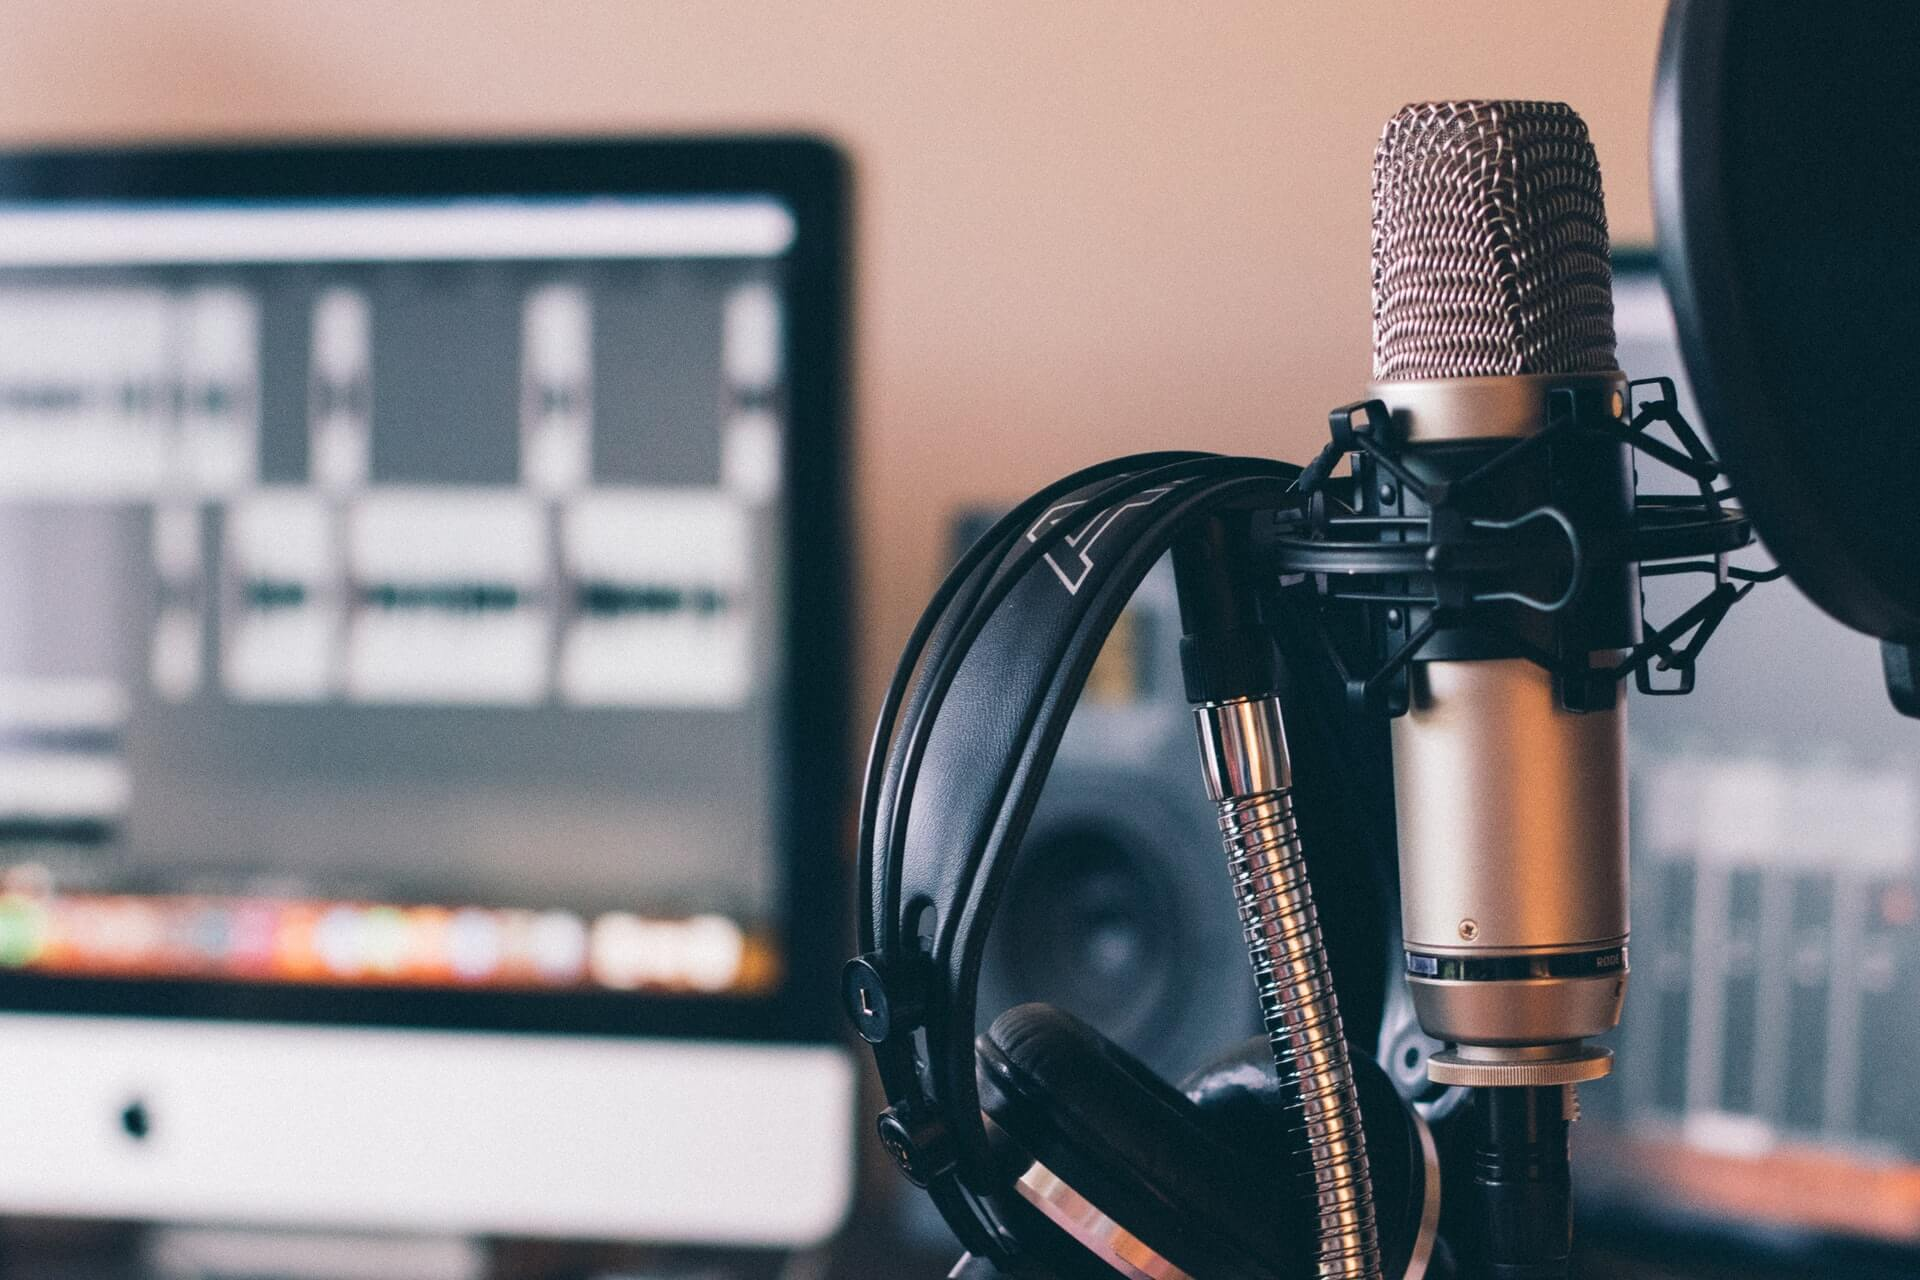 【AdAudio】AdAudio廣告合作大公開!誰能合作?怎麼合作?